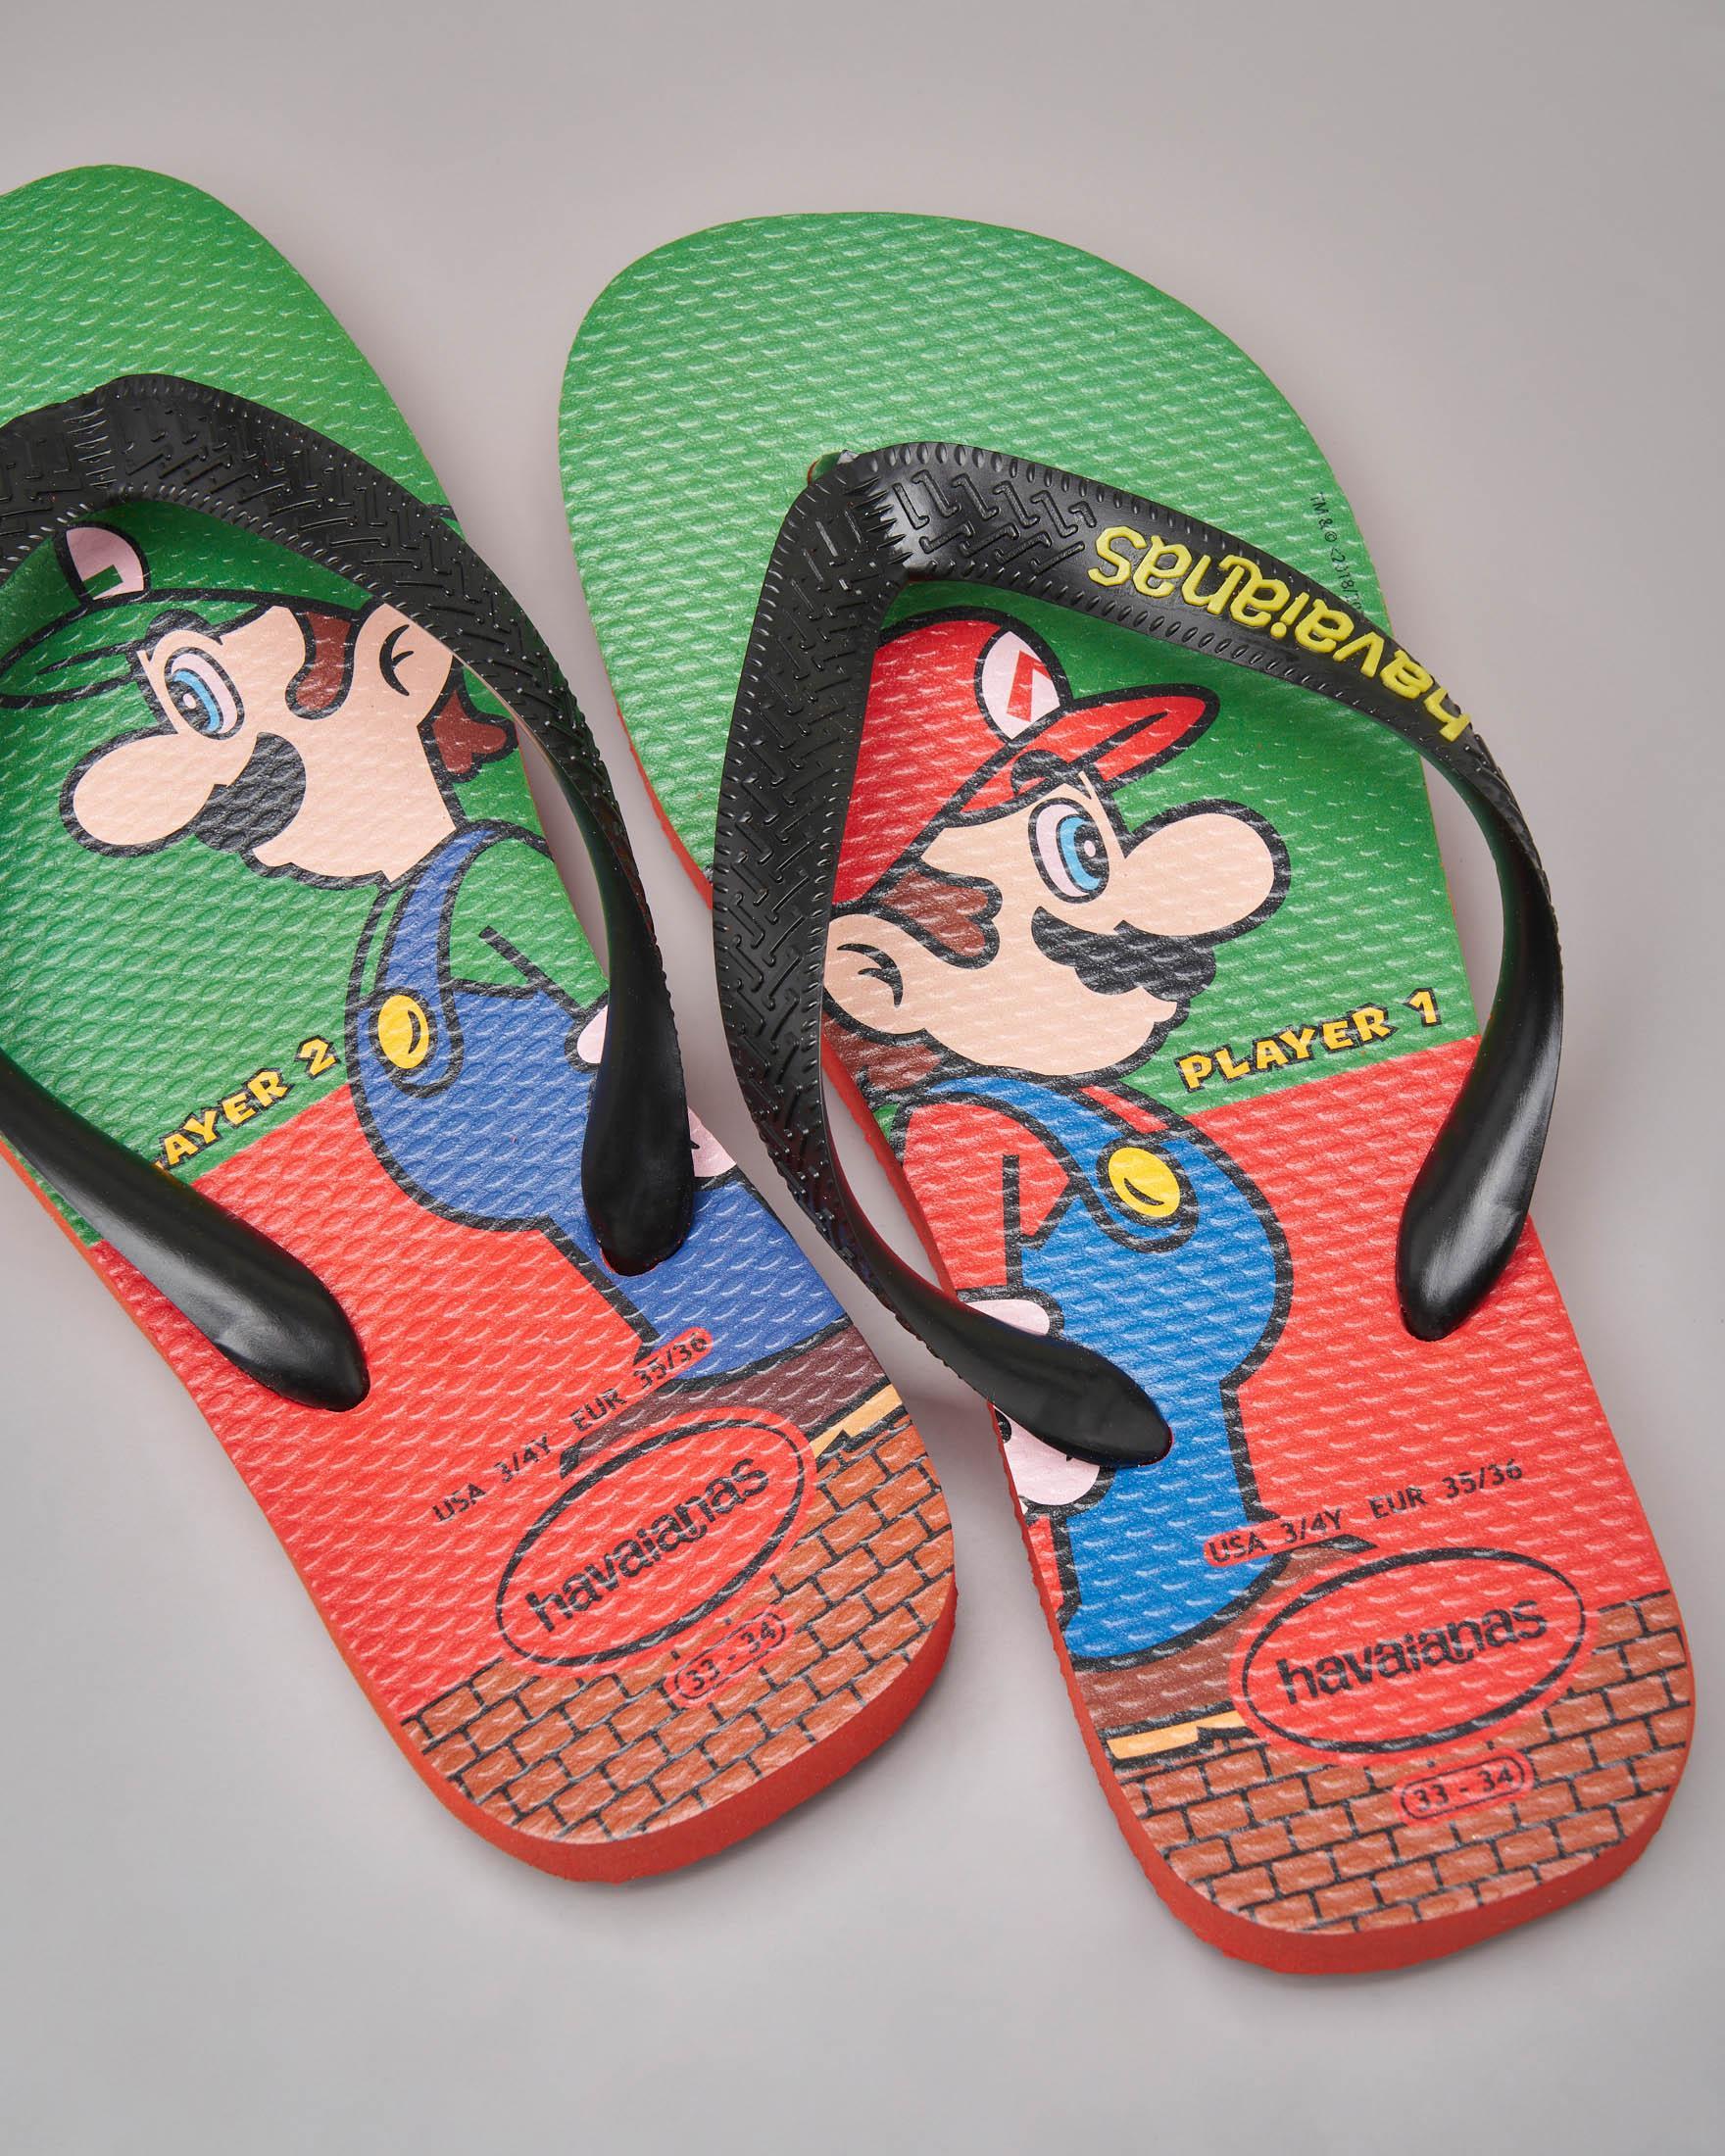 Havaianas rosse e verdi con Mario e Luigi Bros